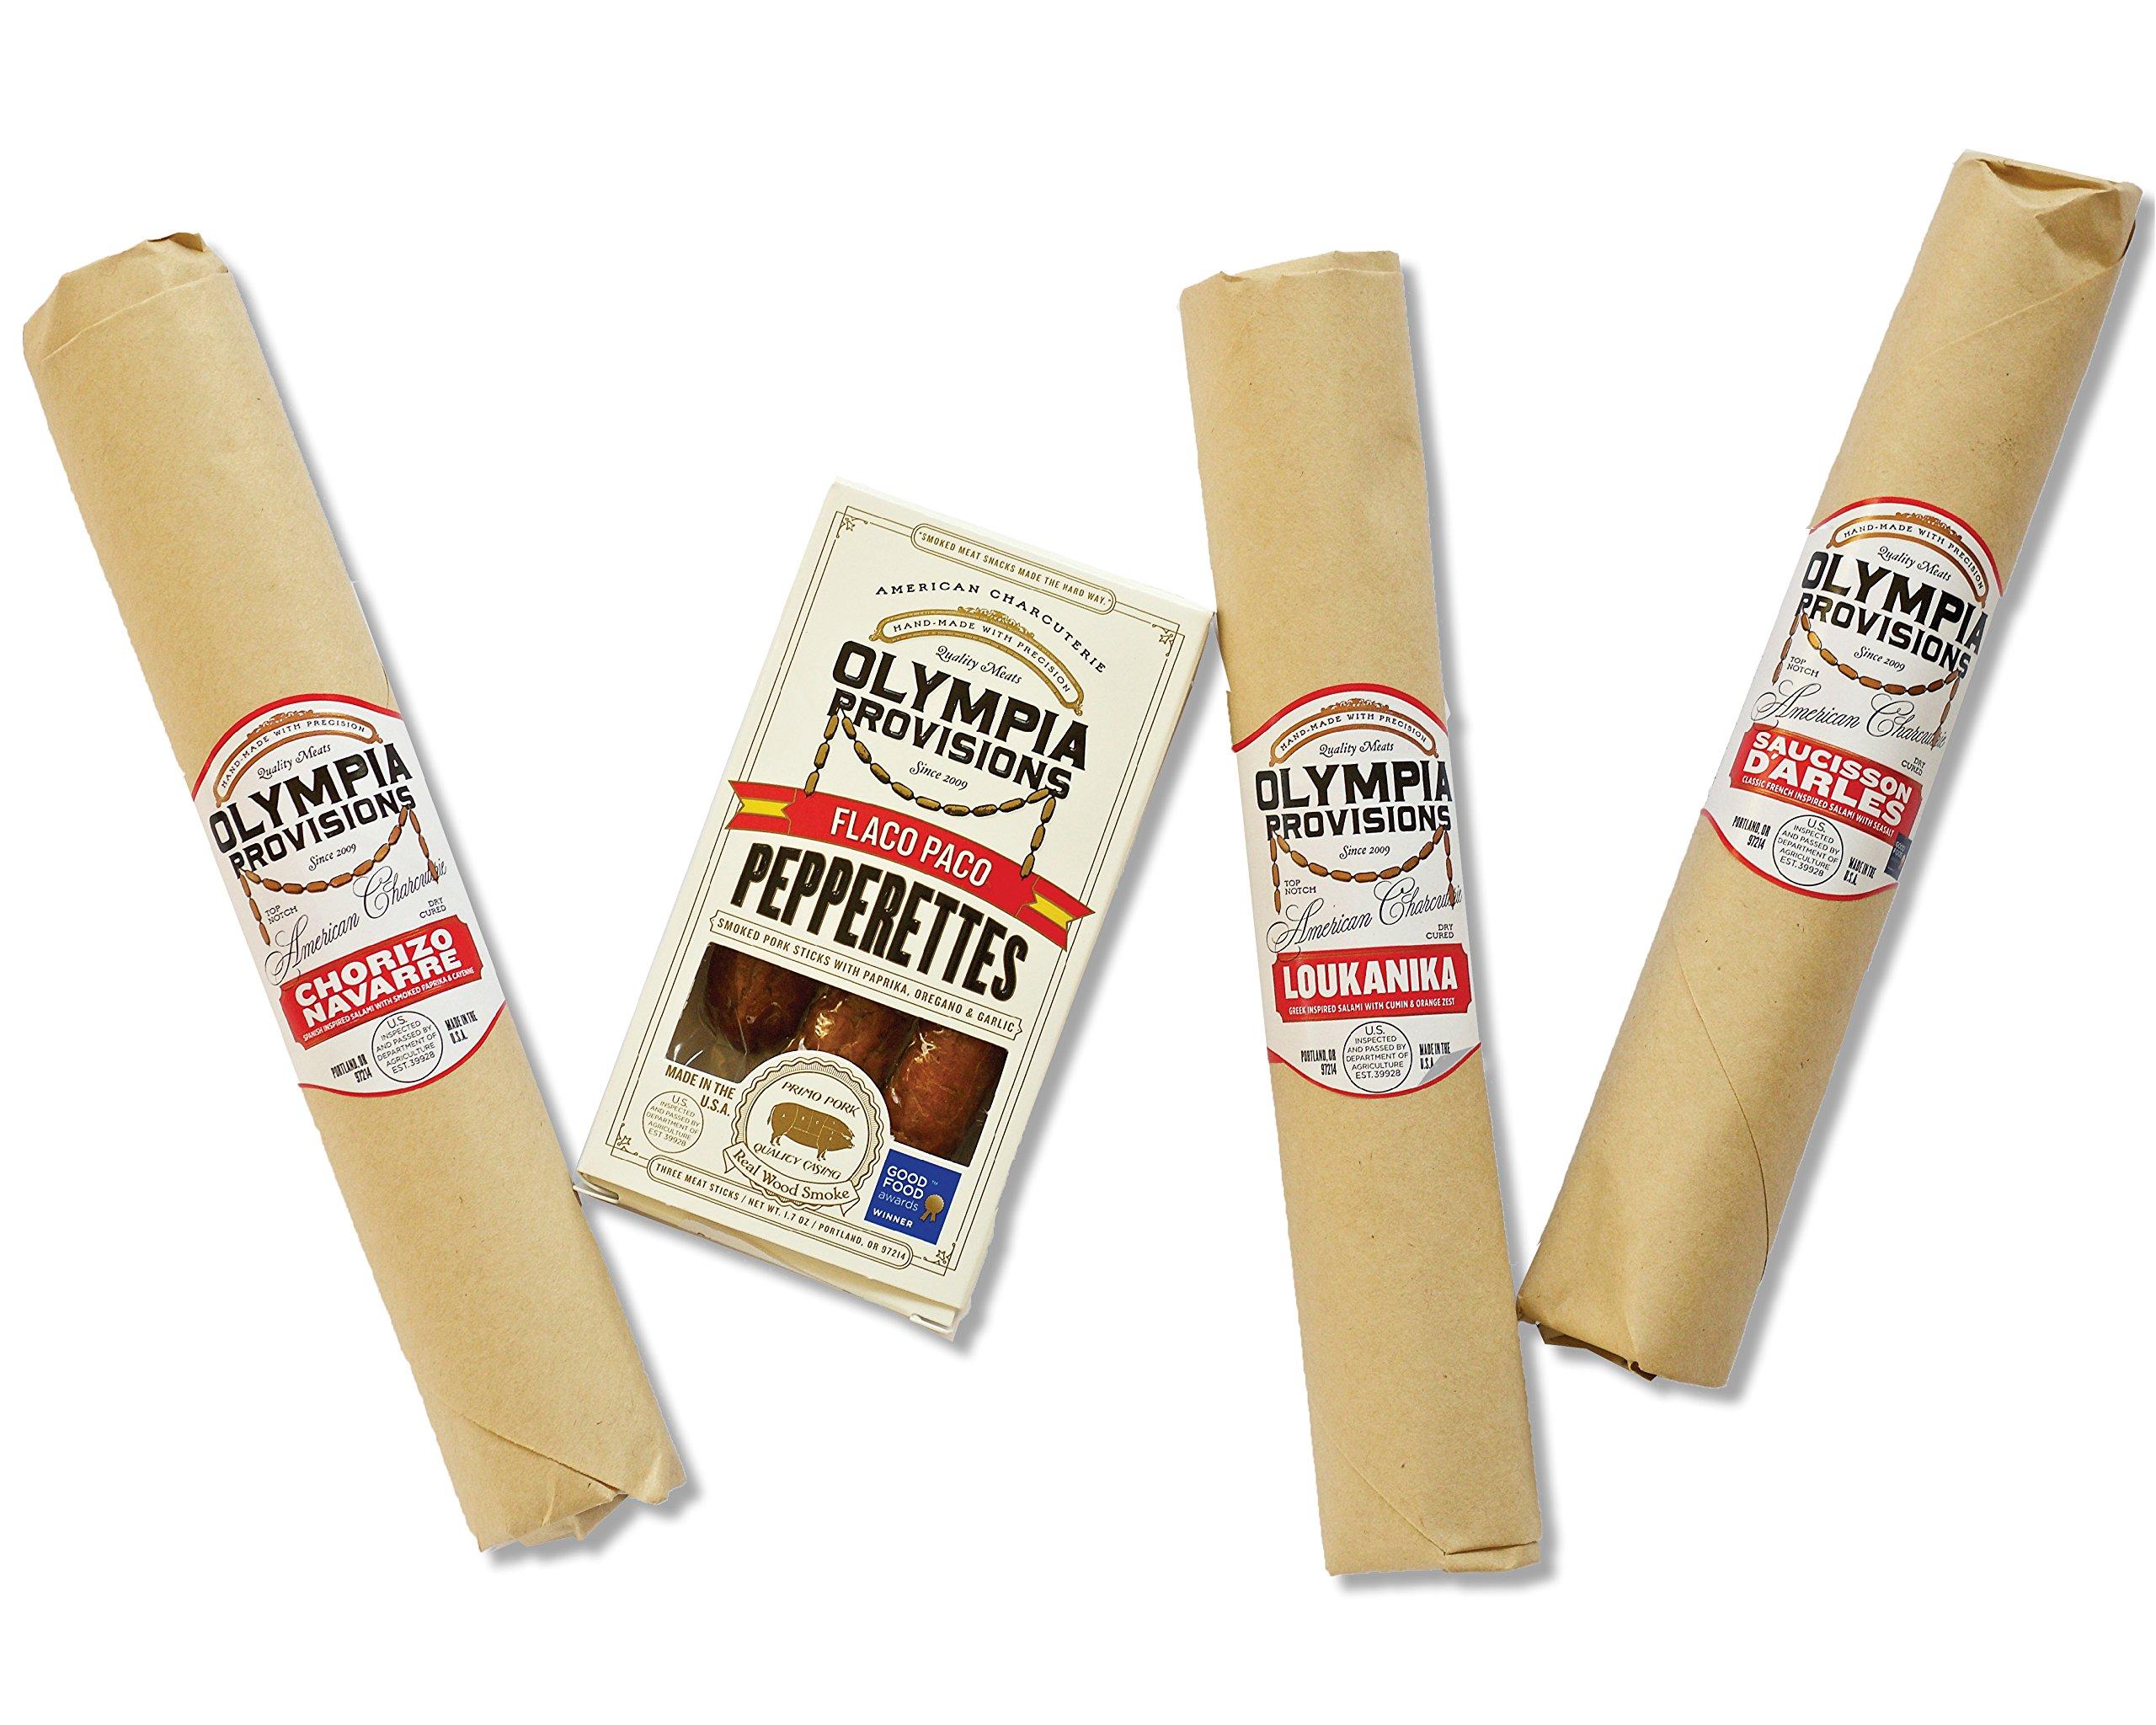 Olympia Provisions Petite Good Food Award Winning Charcuterie Gift Box